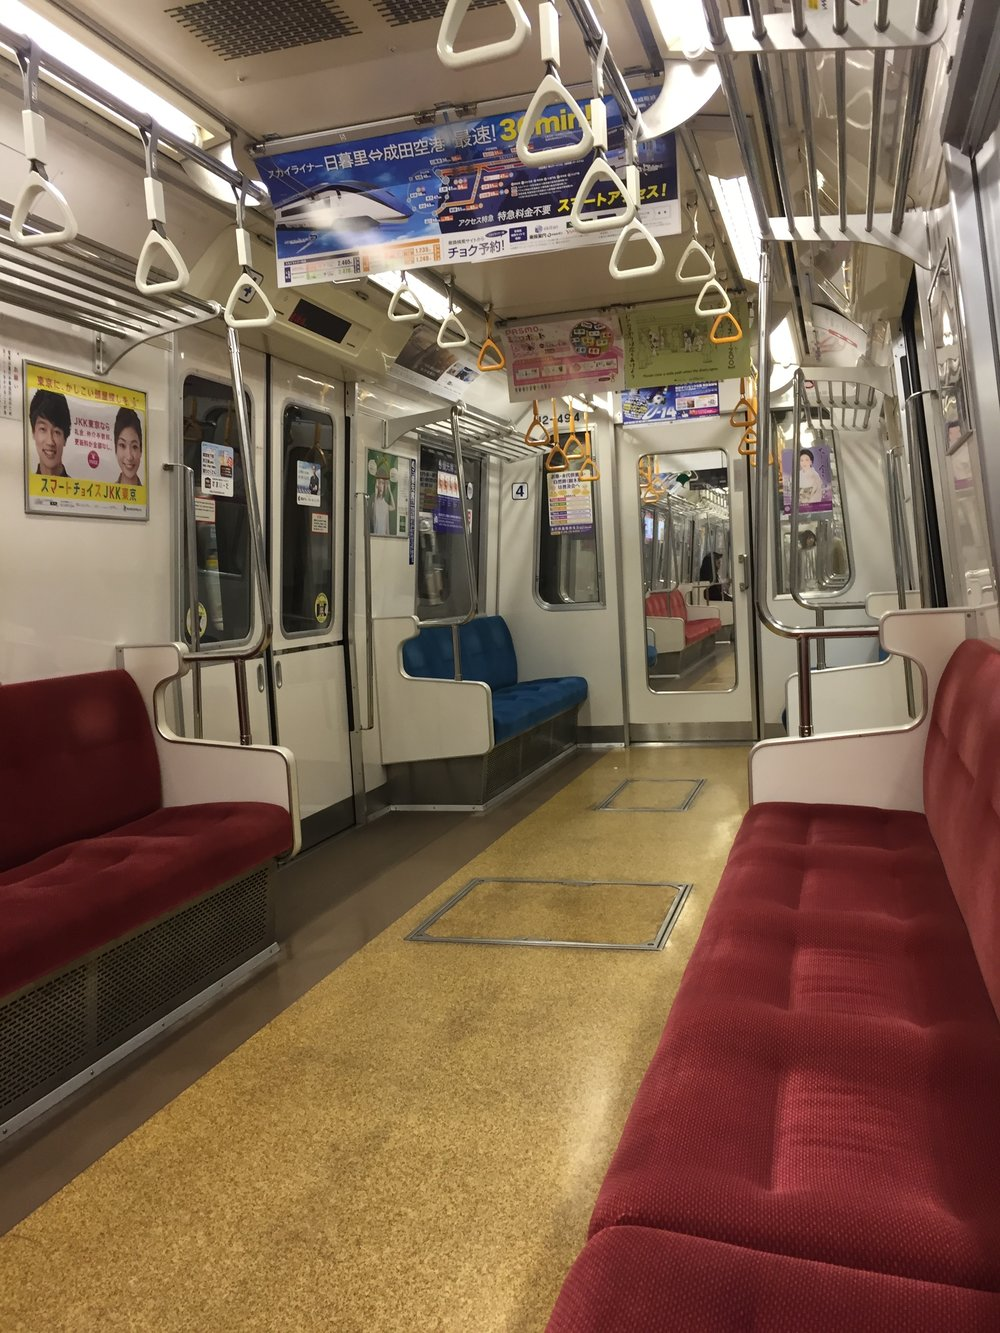 Japanese subway cart